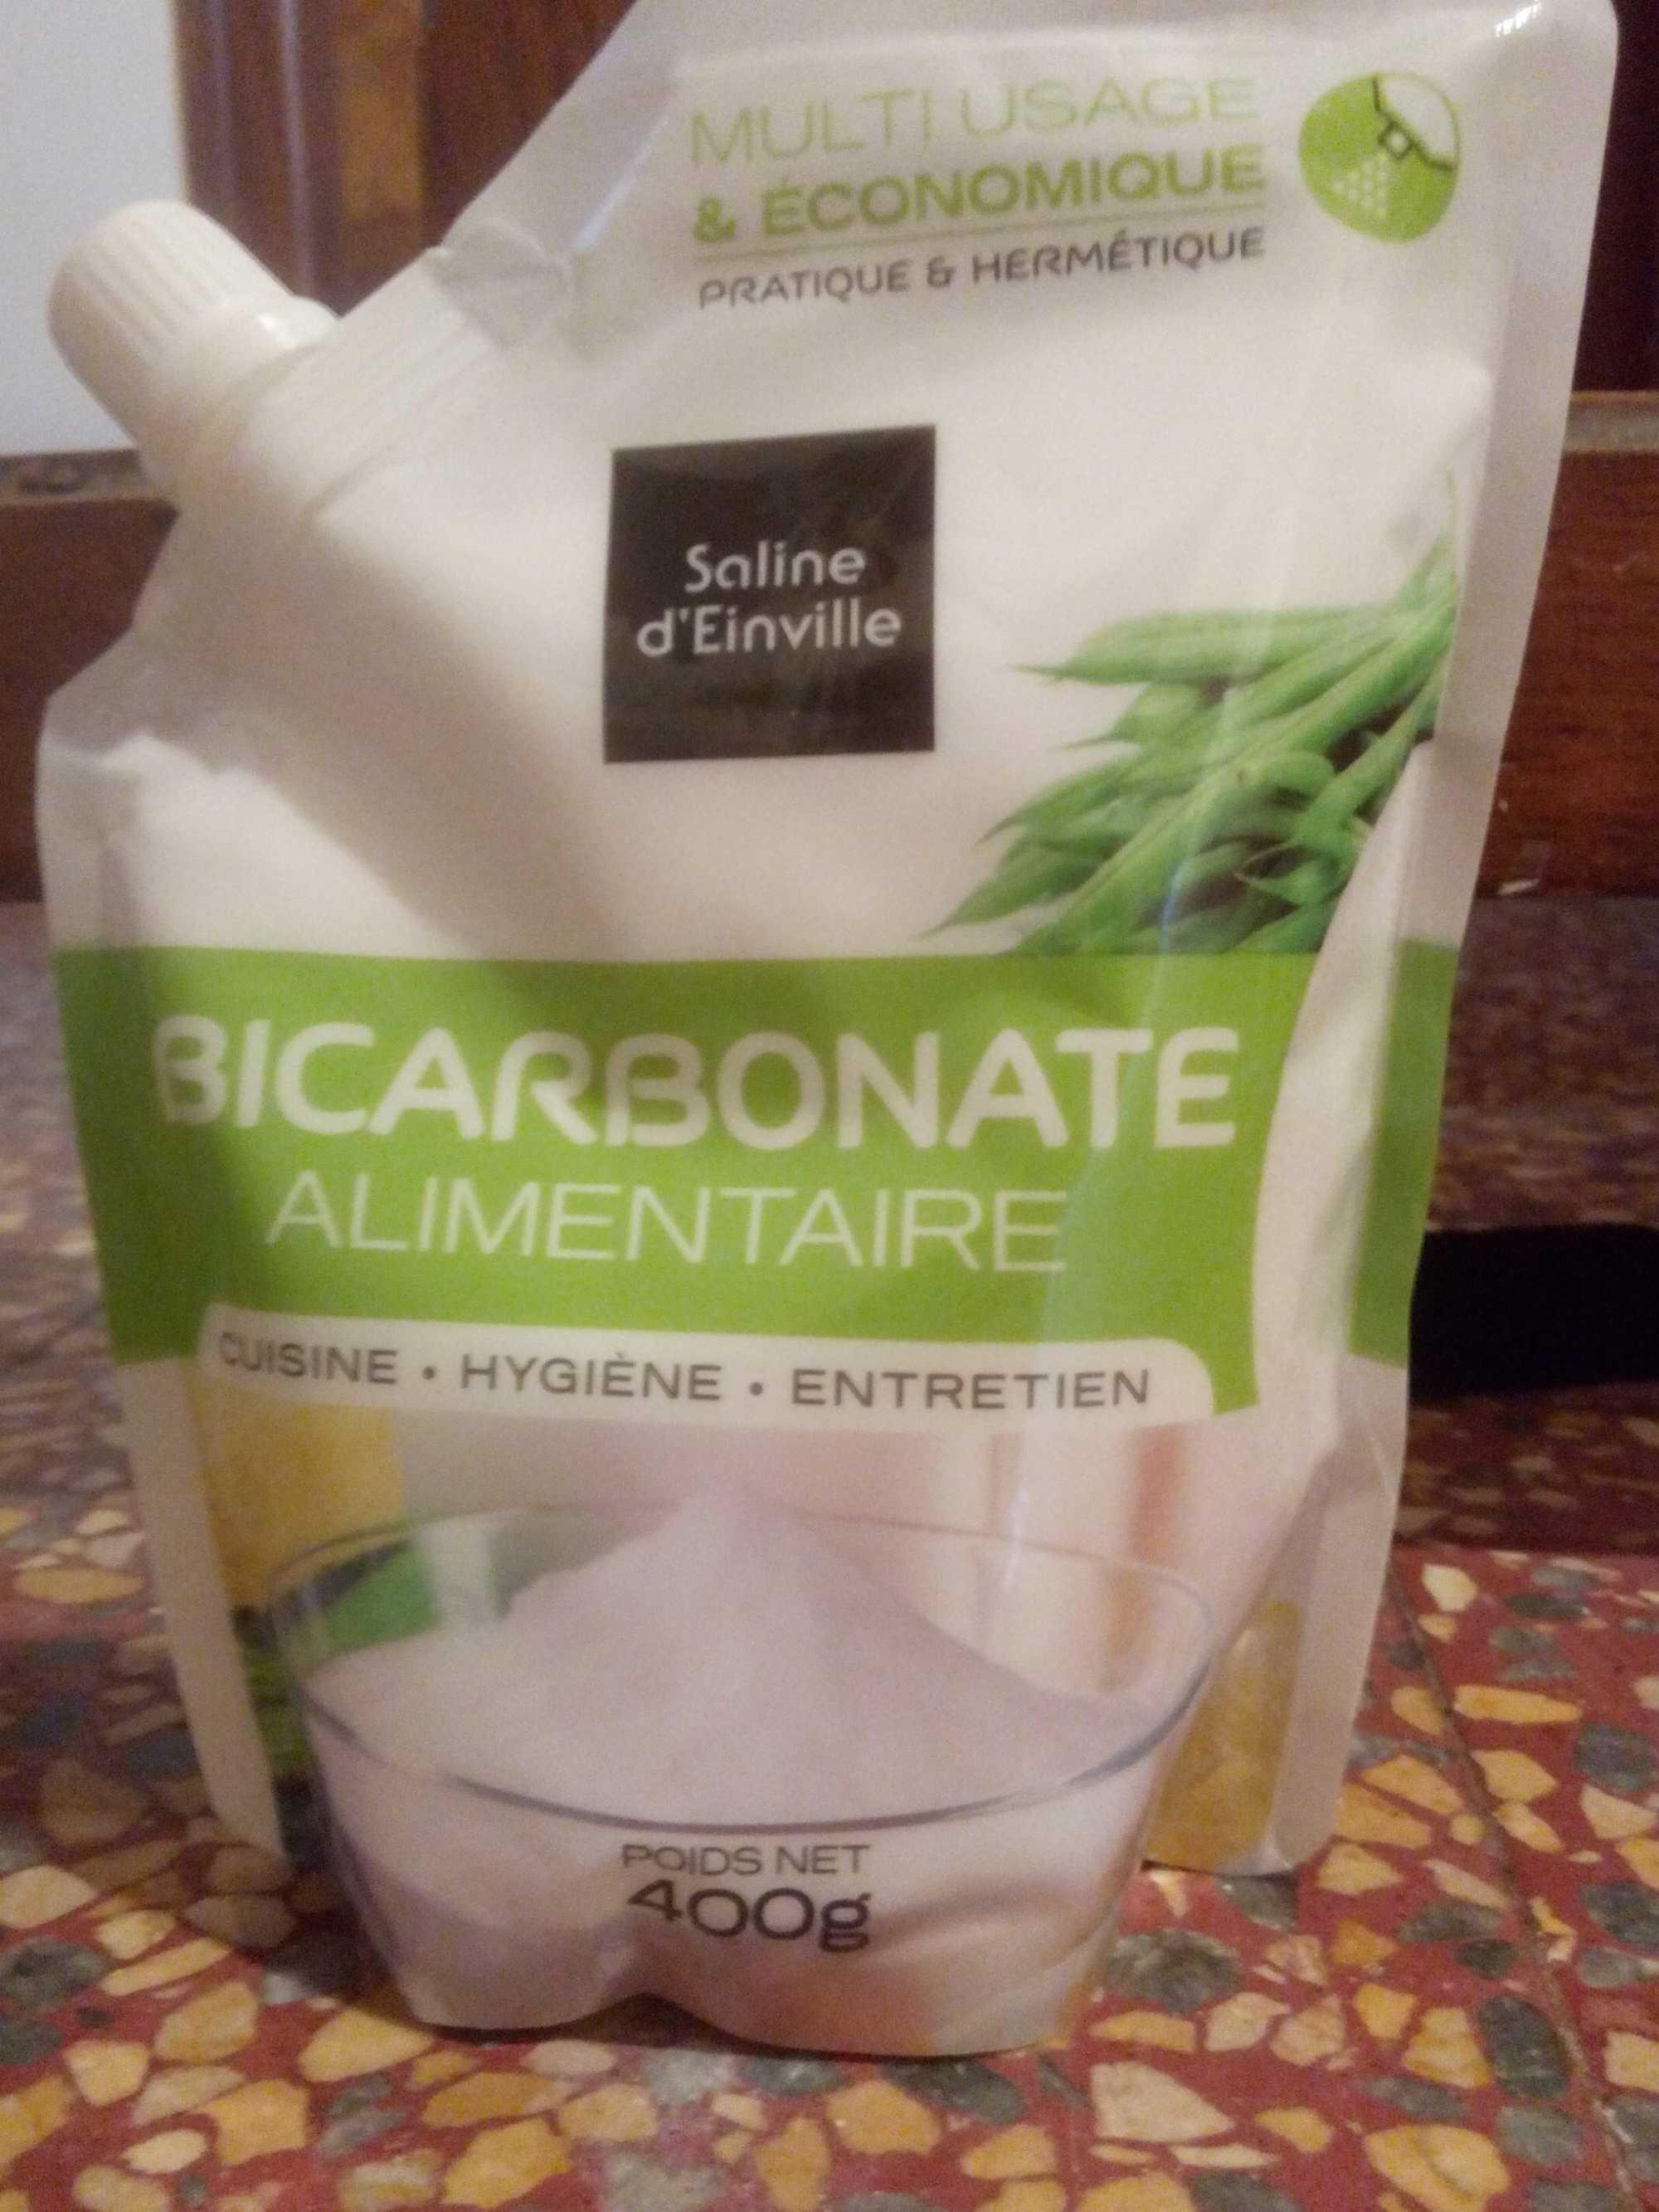 Bicarbonate alimentaire saline d einville 400 g - Bicarbonate d ammonium cuisine ...